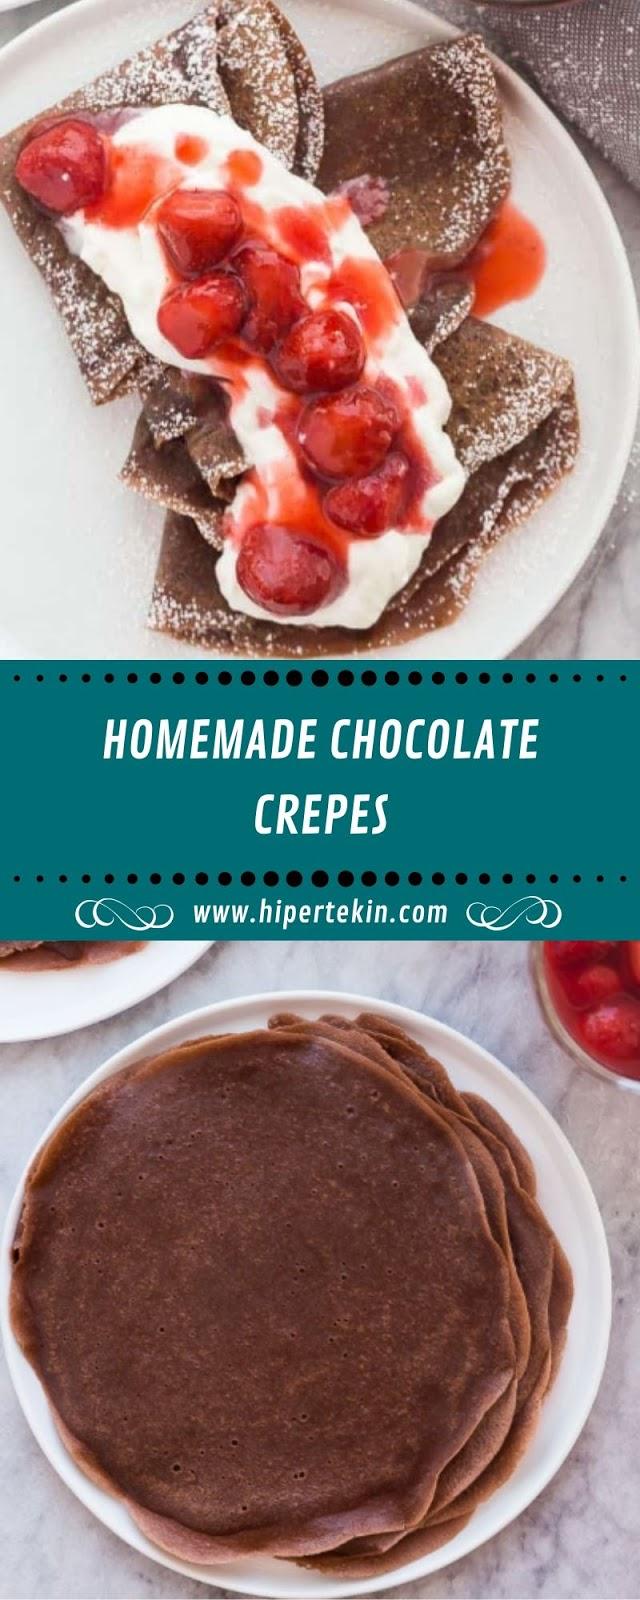 HOMEMADE CHOCOLATE CREPES